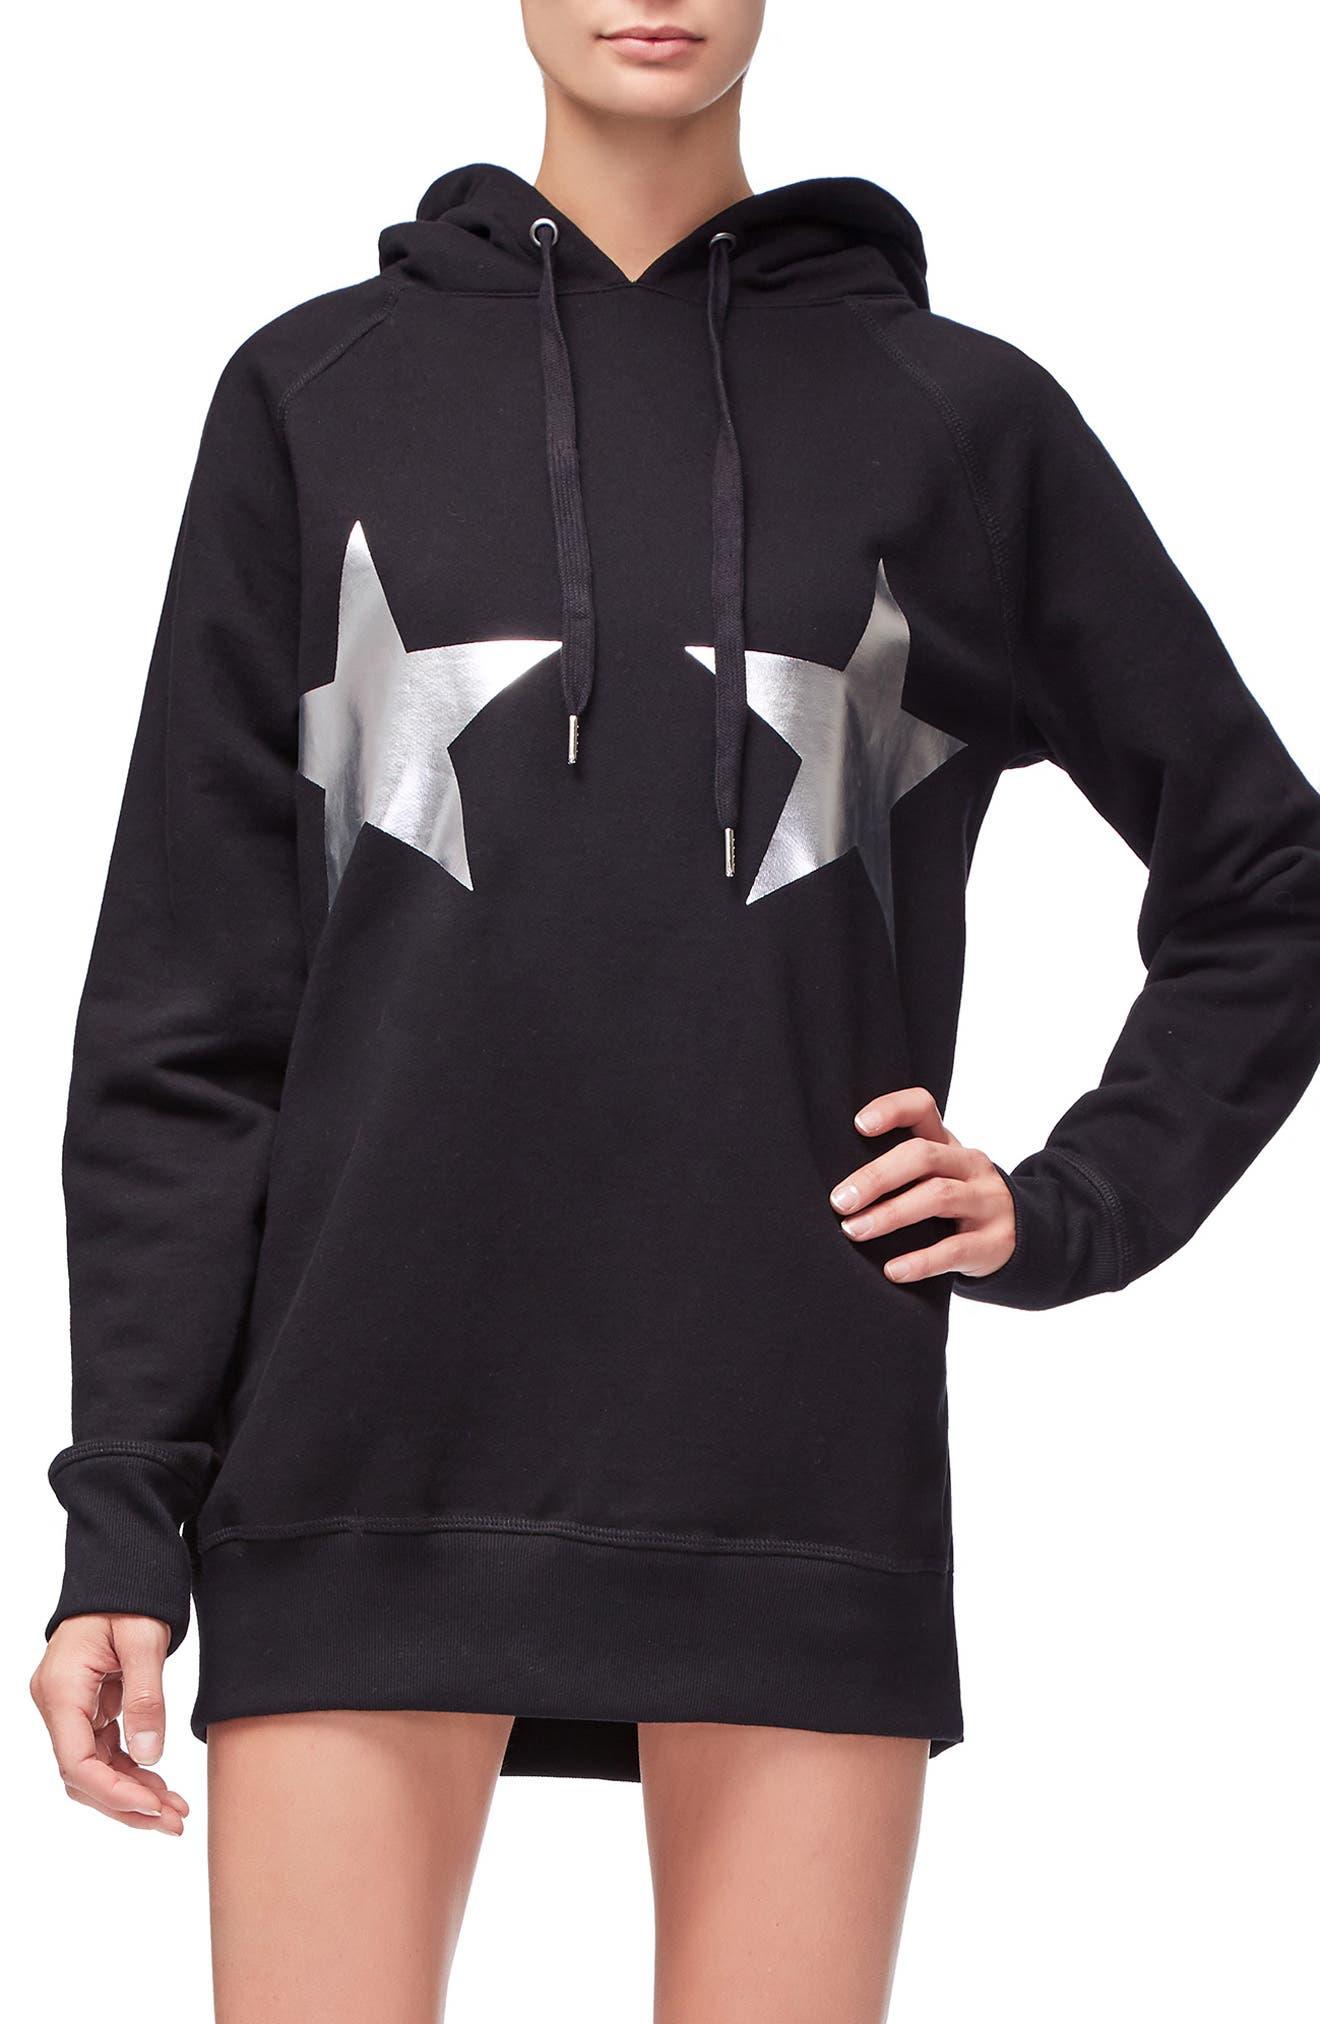 Goodies Stars & Stripes Hoodie,                         Main,                         color, 001